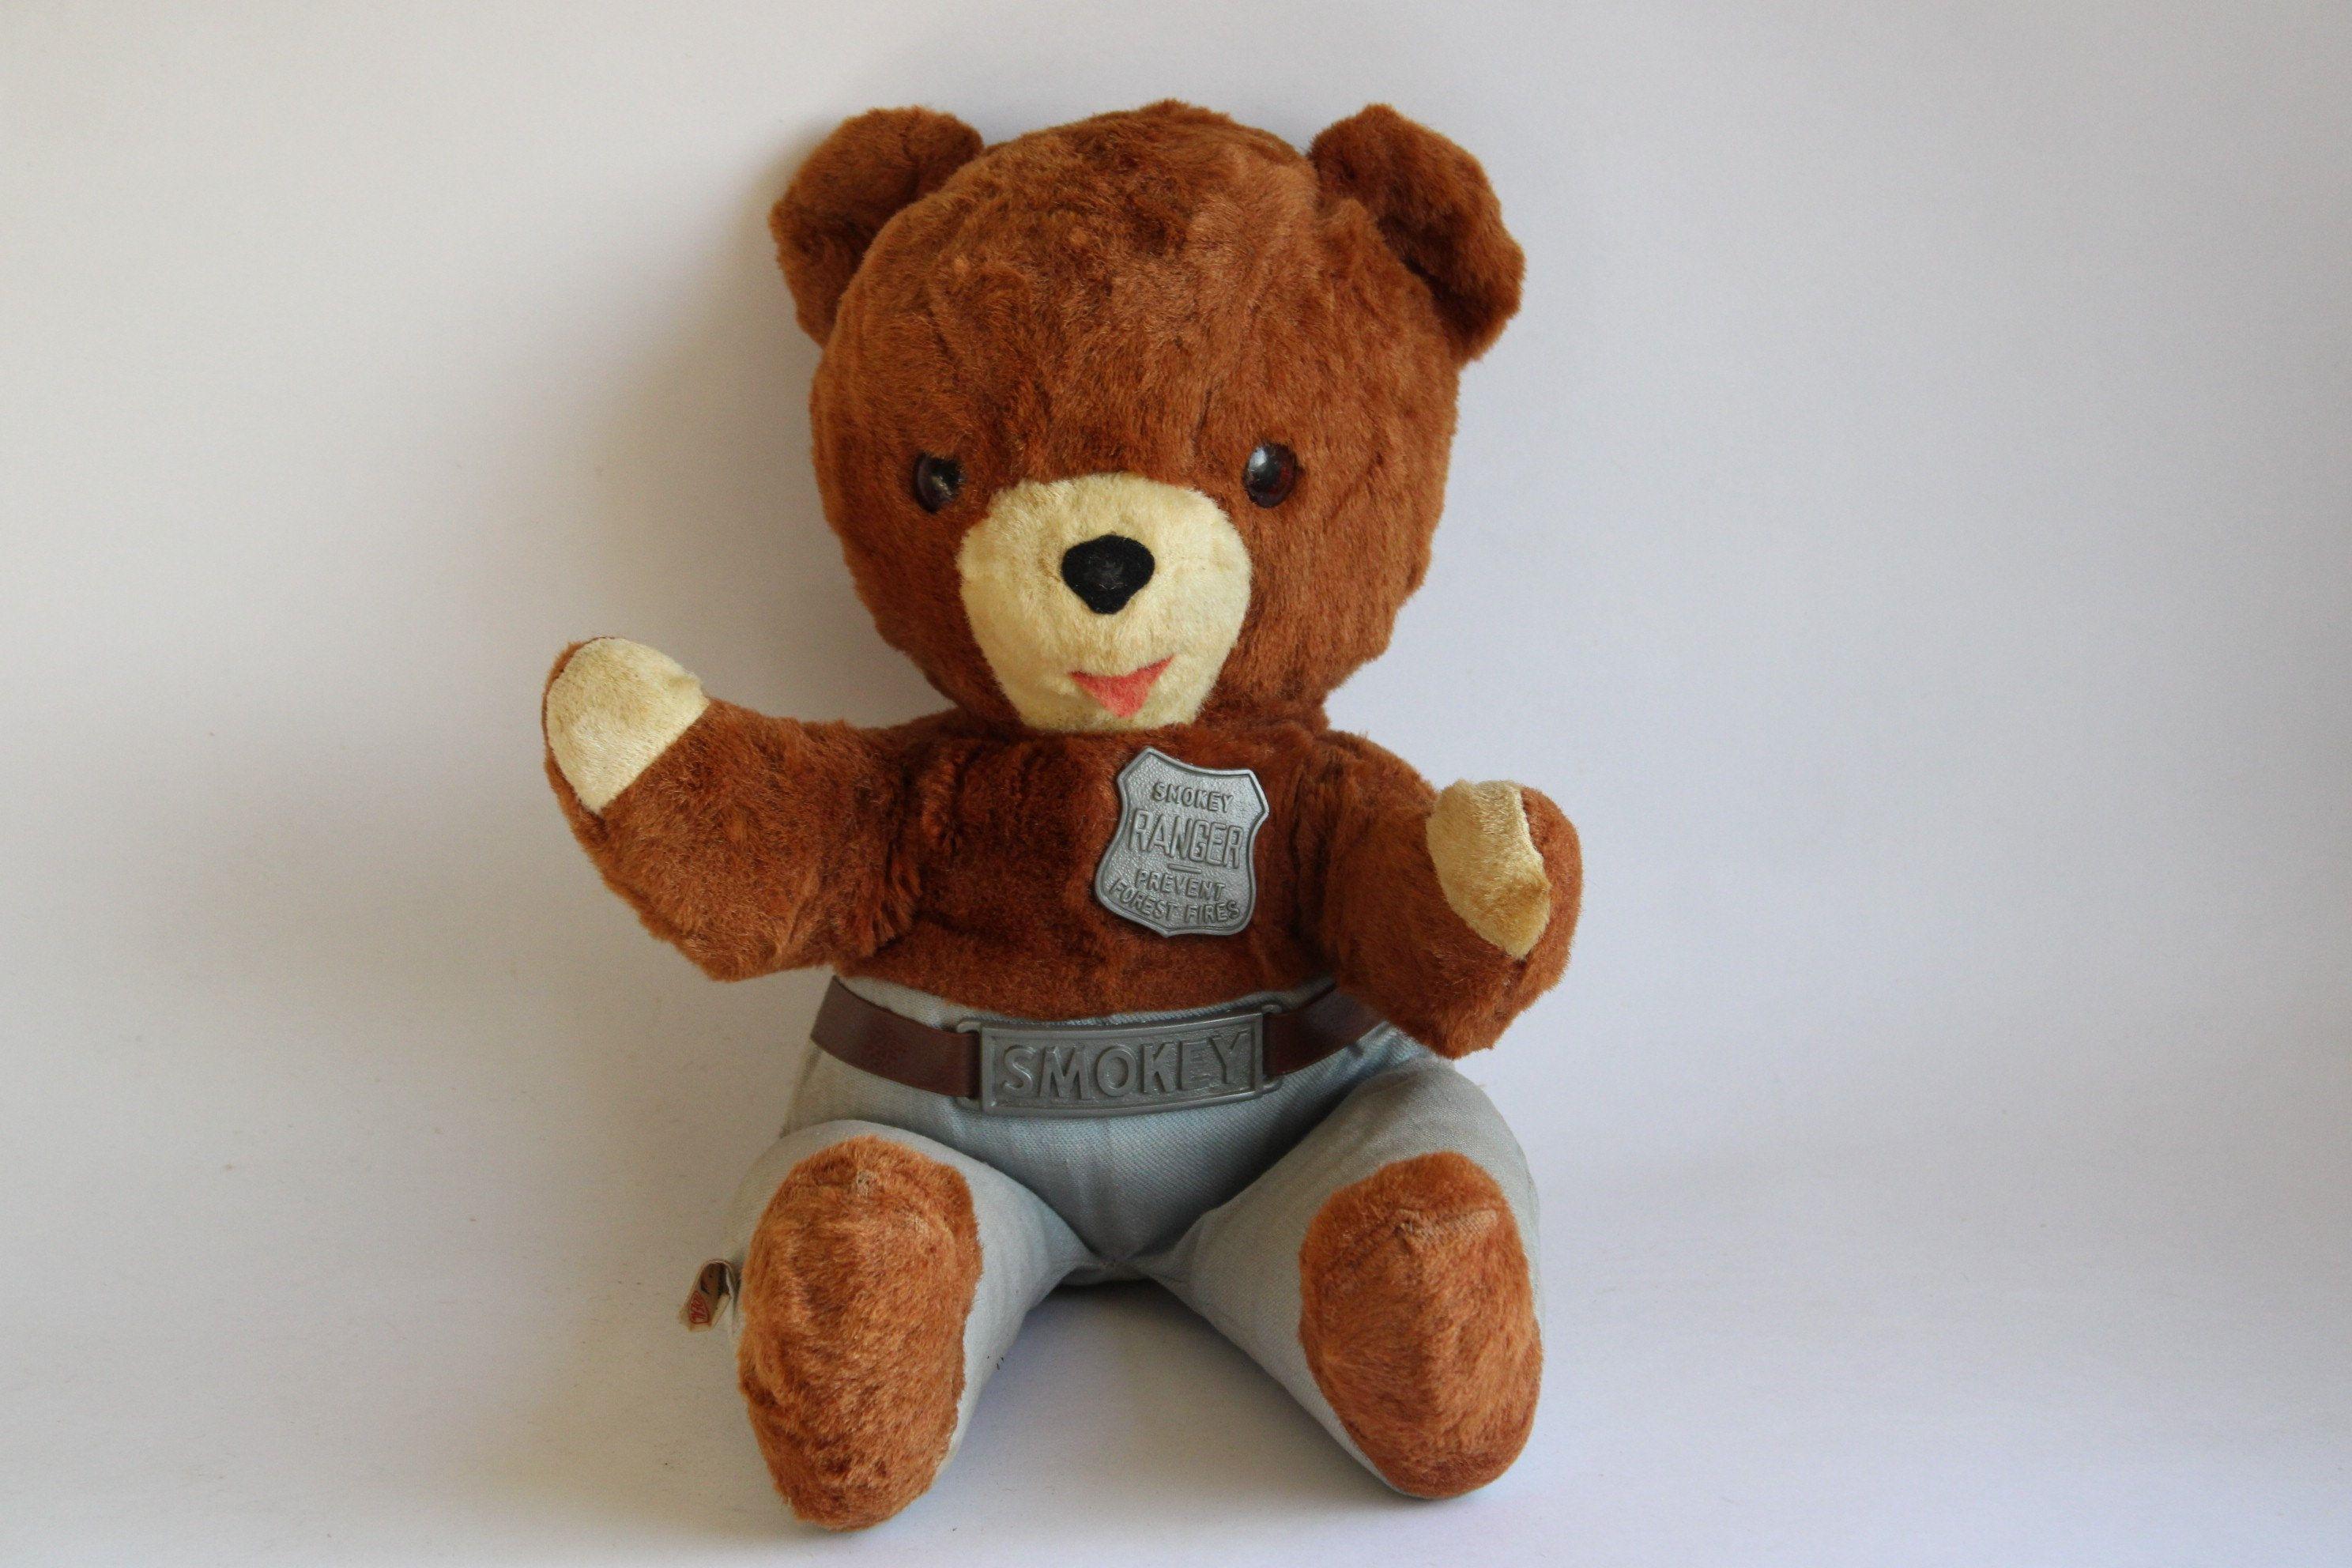 Vintage Ideal Smokey The Bear Ranger Stuffed Plush Animal Etsy Smokey The Bears Plush Animals Bear